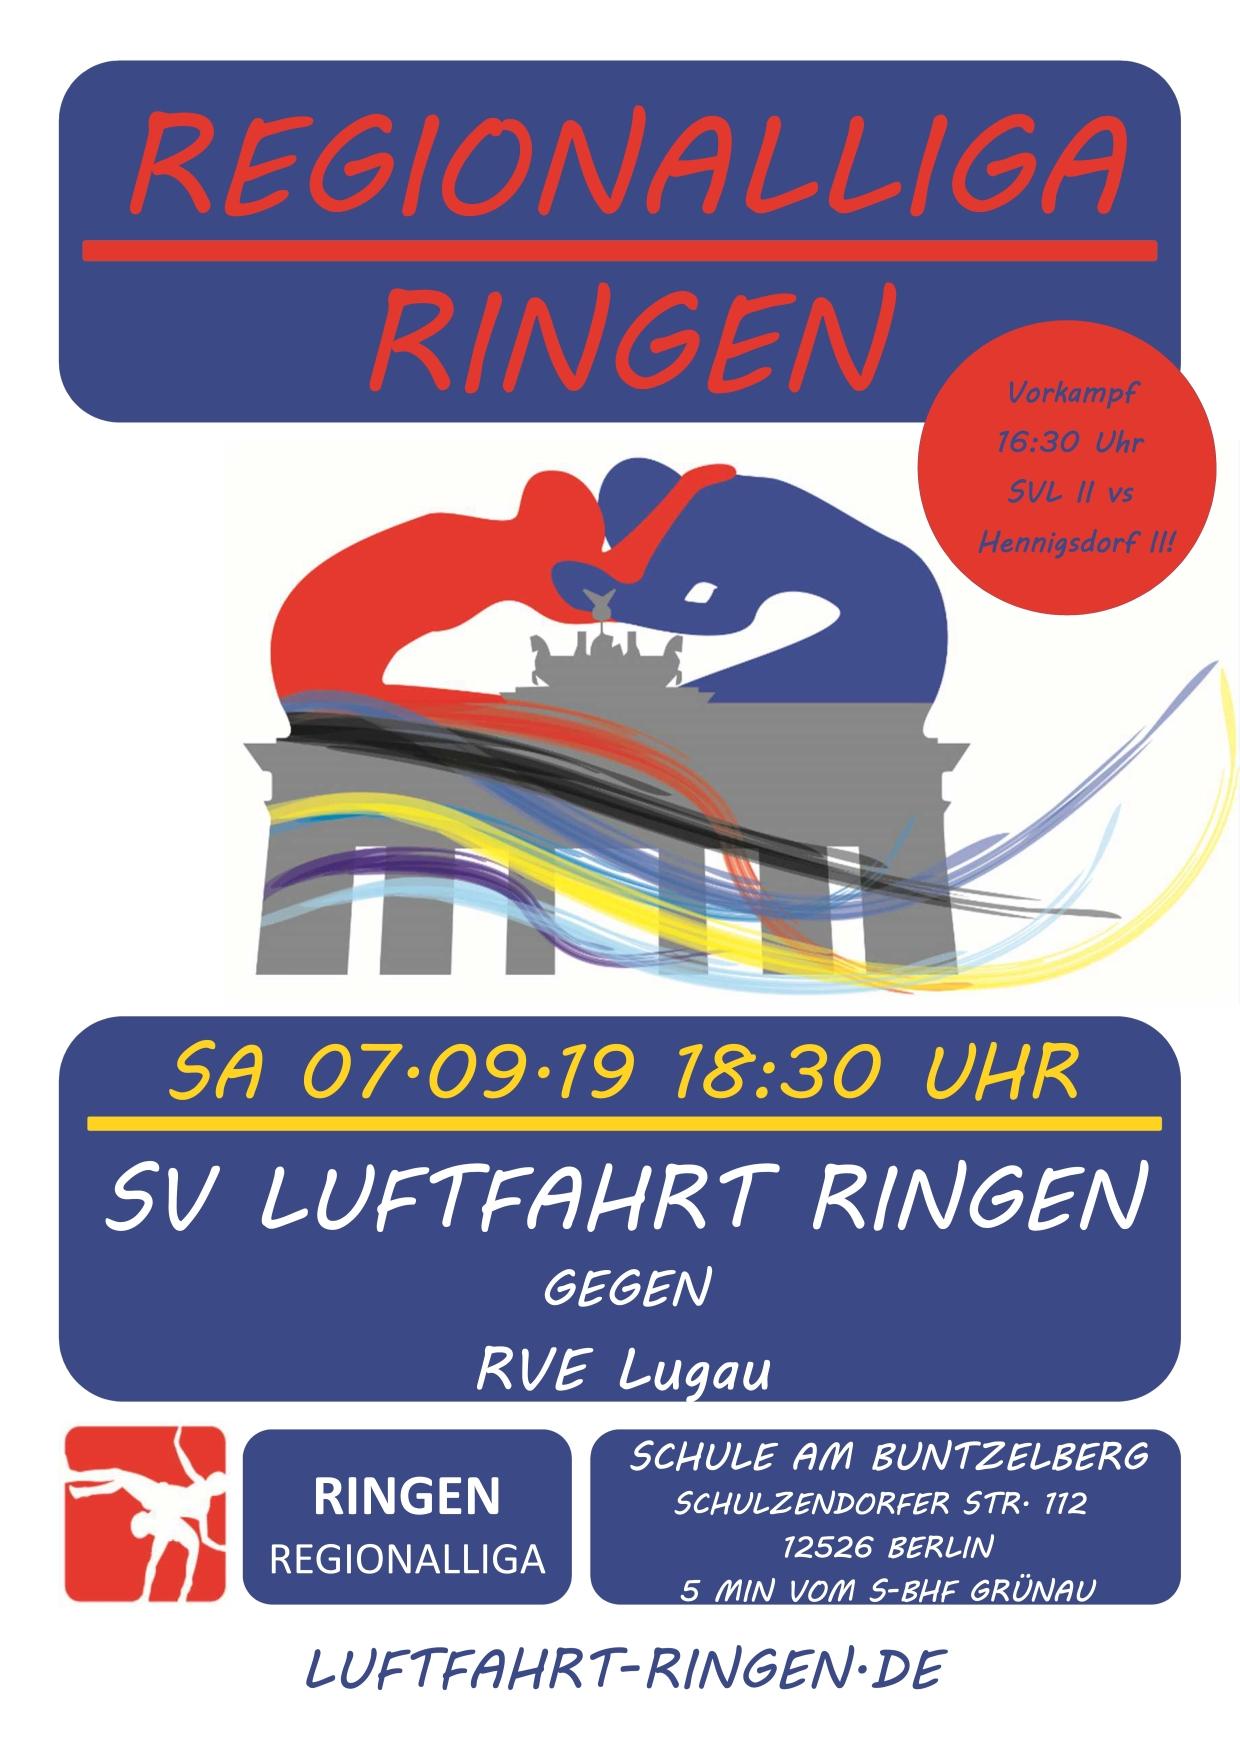 RL-Heimkampf vs RVE Lugau